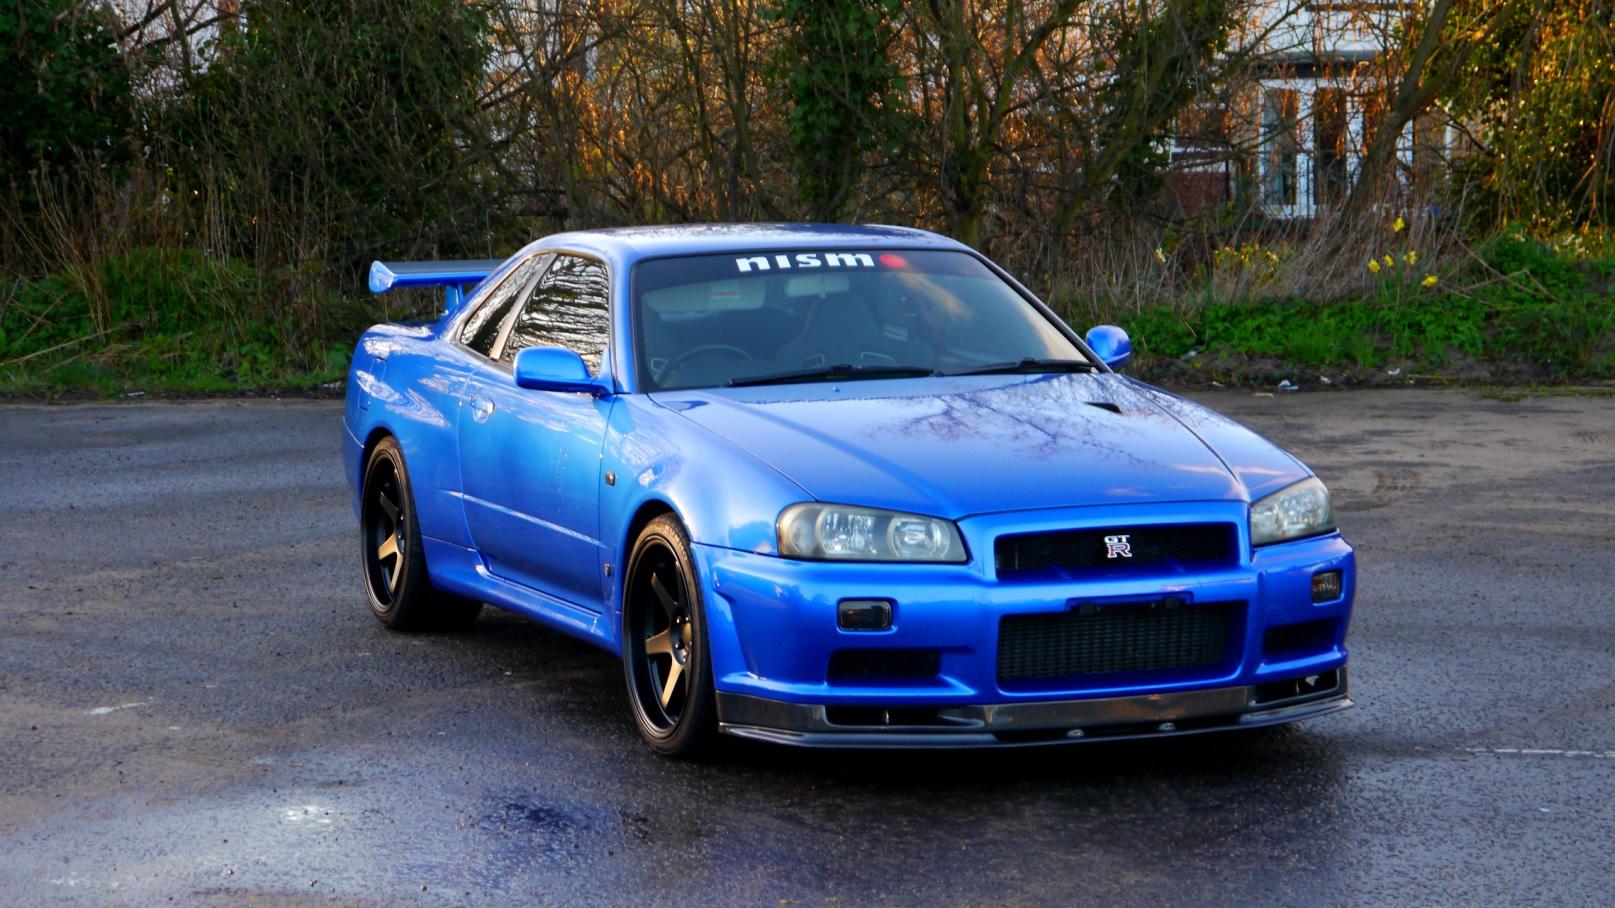 Gtr R34 For Sale >> 1999 Nissan Skyline R34 GTR 6 Speed Manual - JM-Imports